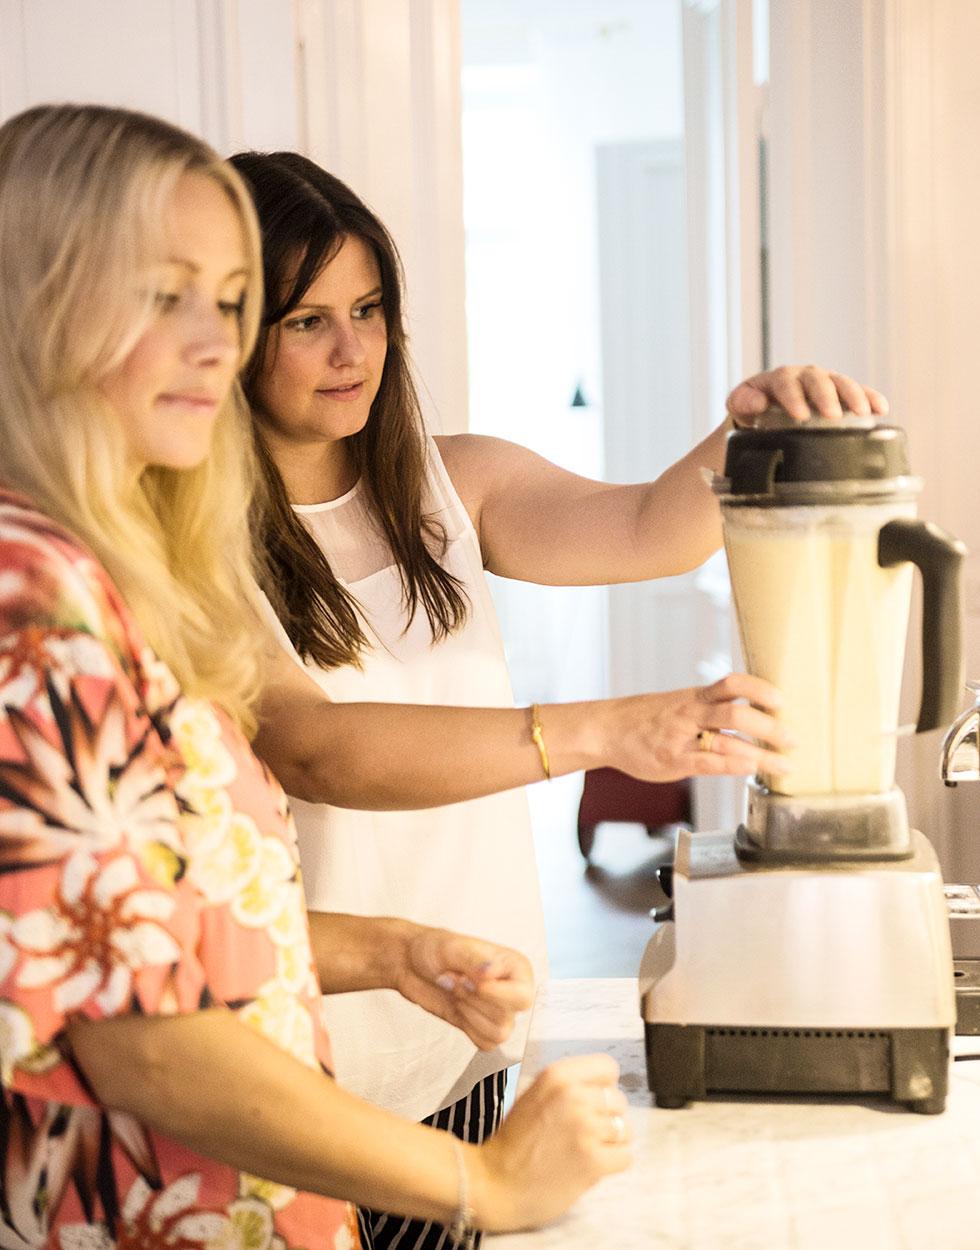 kokbok-fotografering-en-god-morgon-frukostbok-smoothie-anja-forsnor-elina-hassel